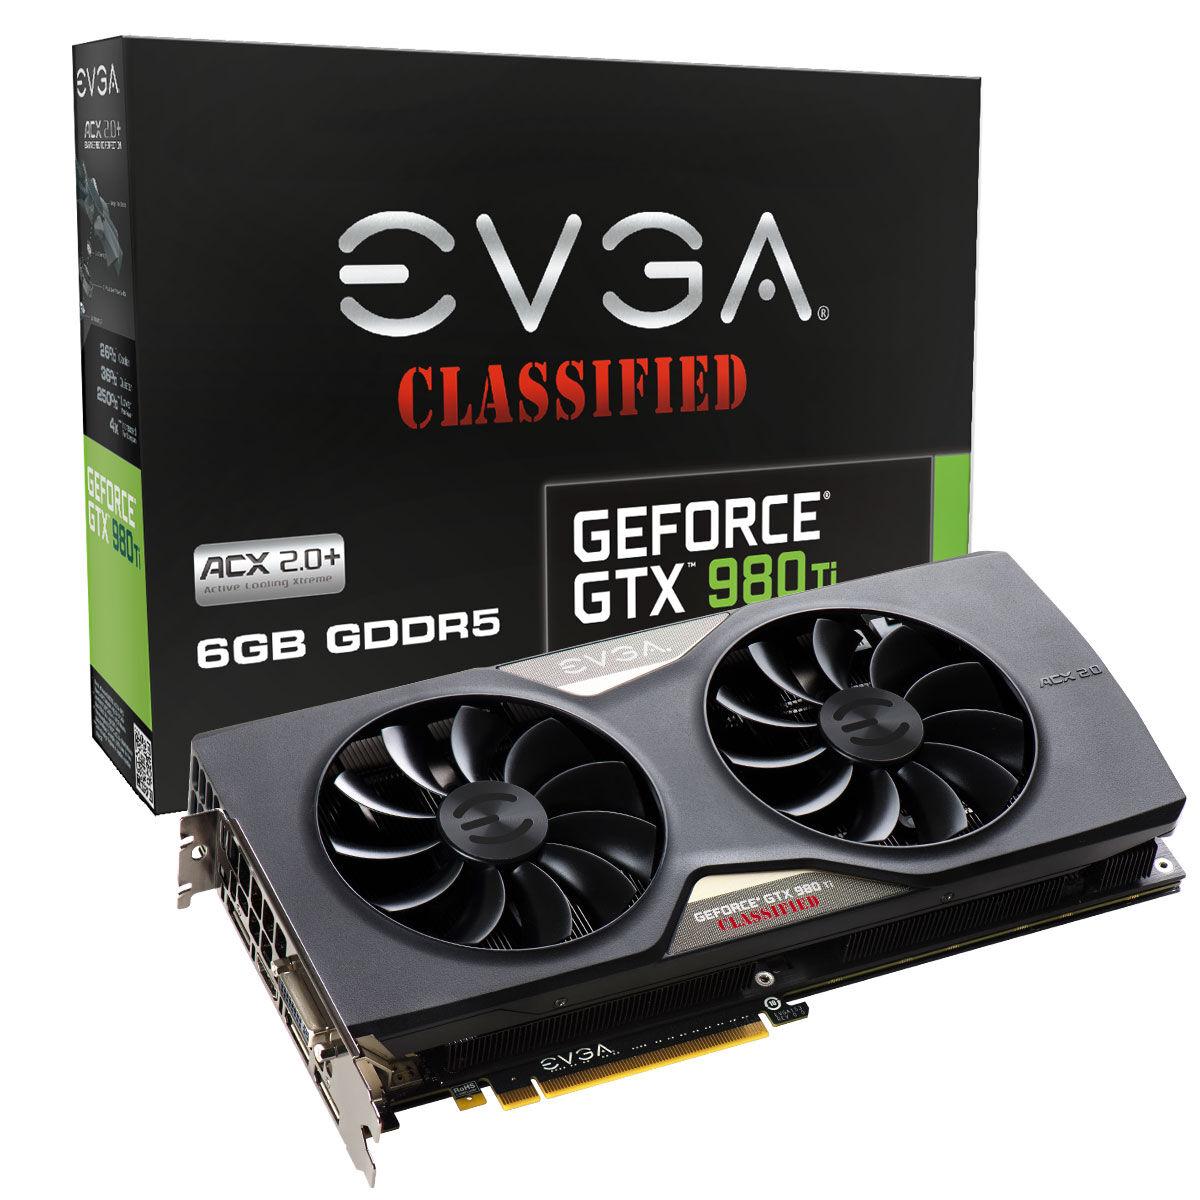 EVGA GeForce GTX 980 Ti Classified ACX 2.0+ announced 19